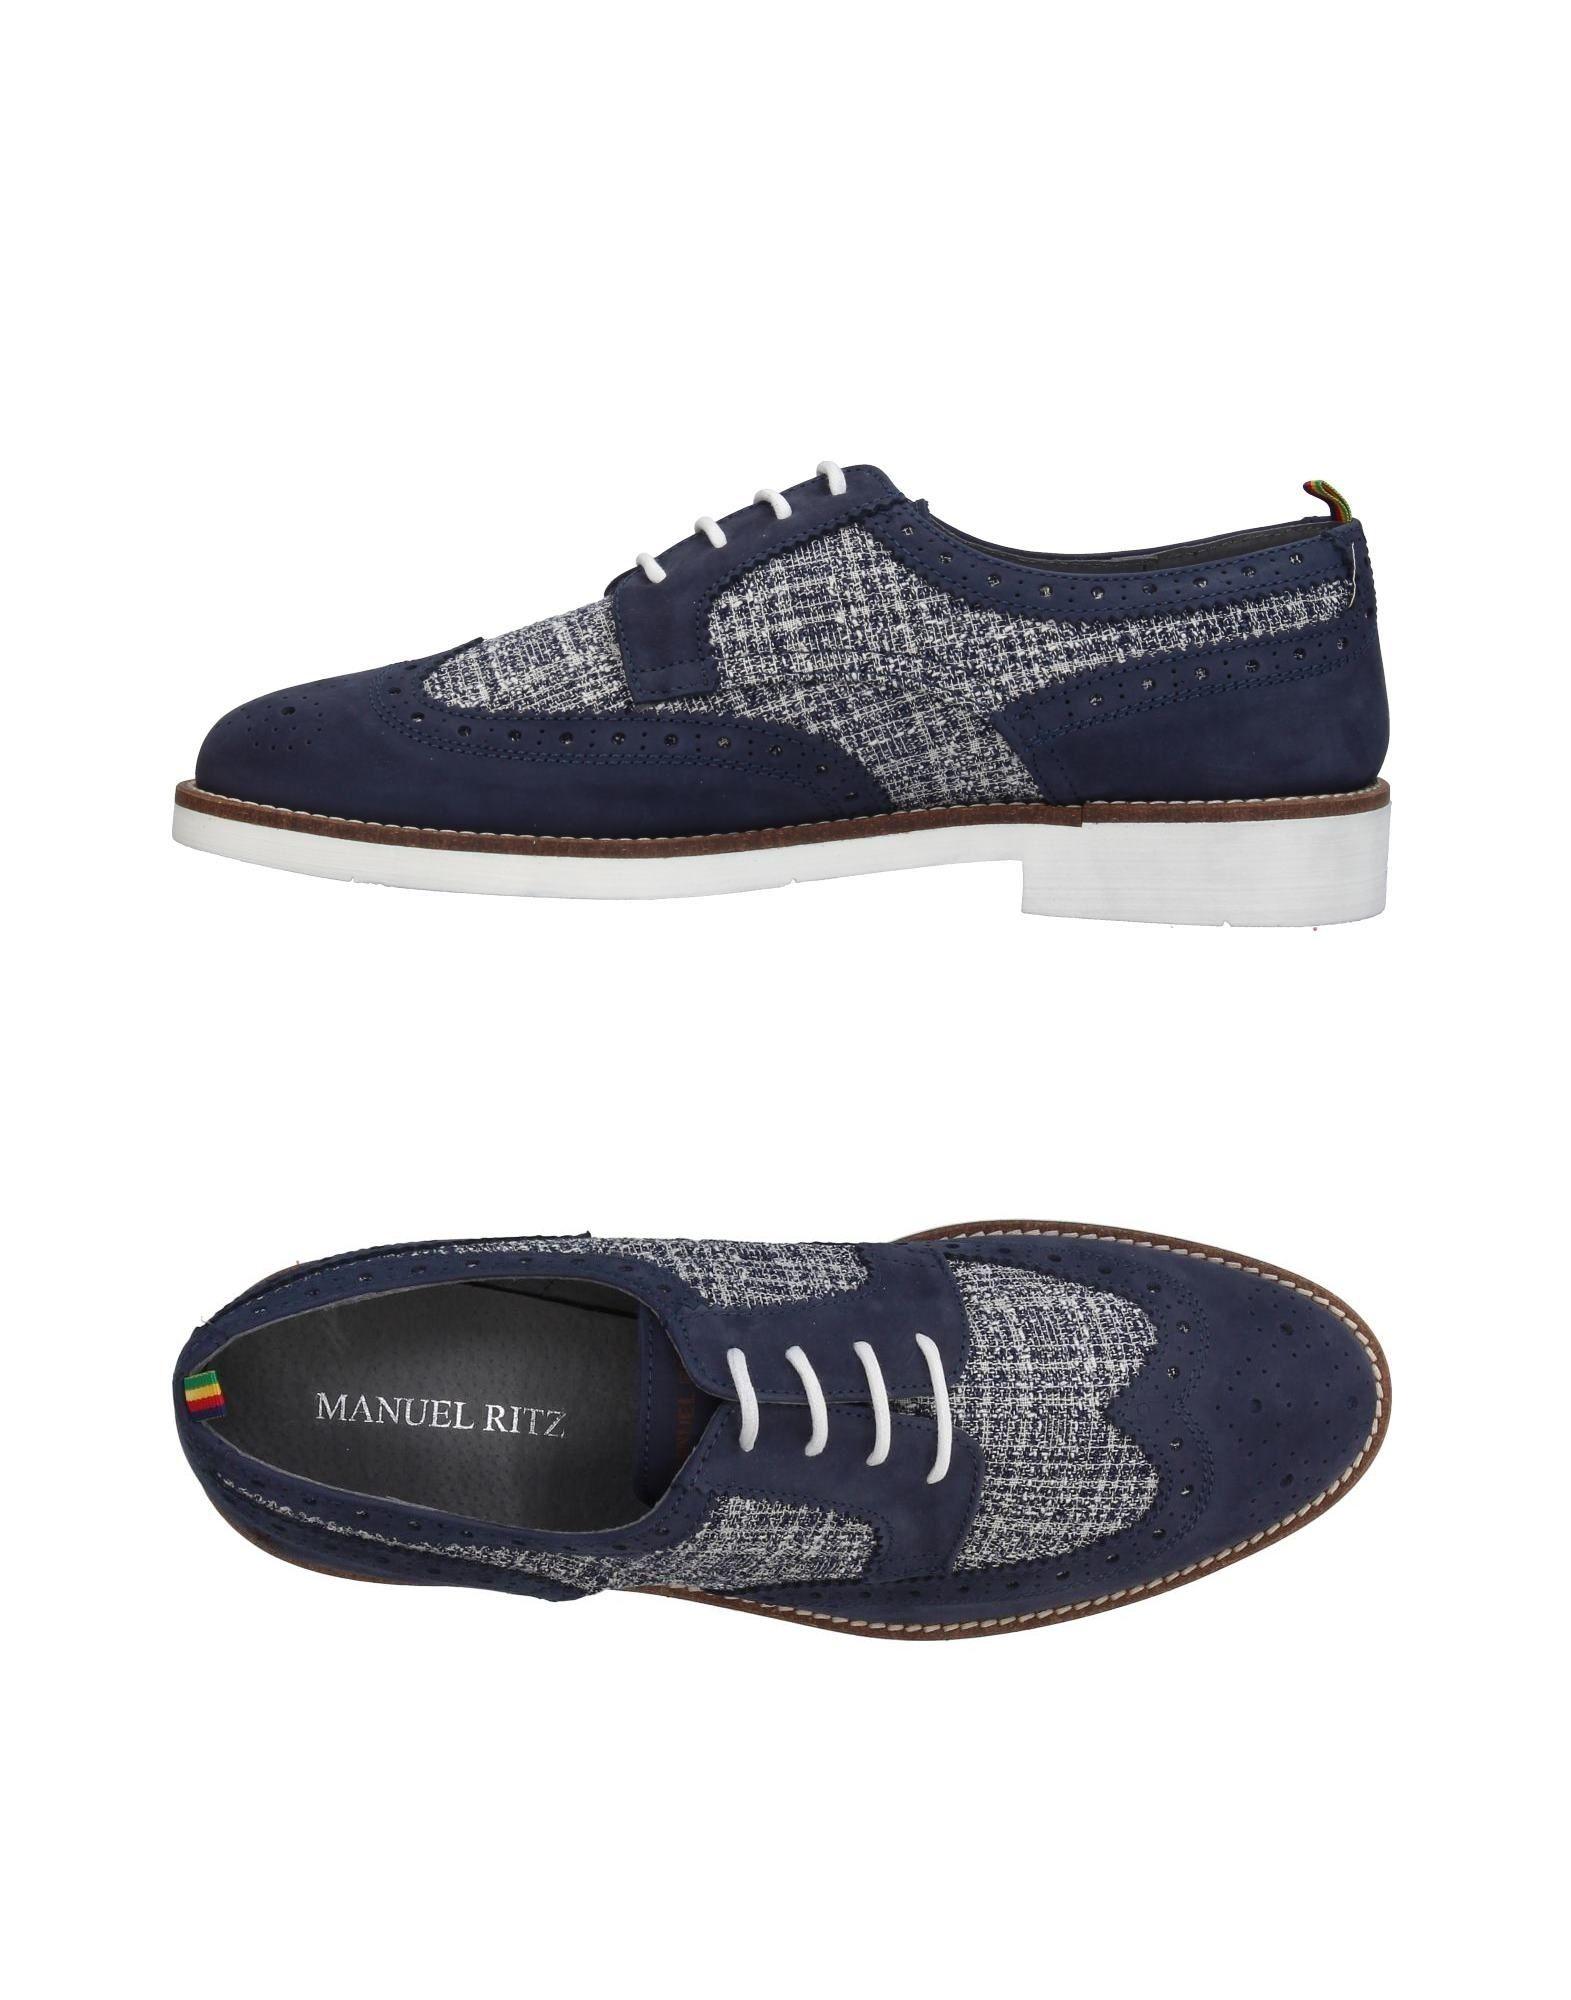 MANUEL RITZ Обувь на шнурках manuel ritz обувь на шнурках page 2